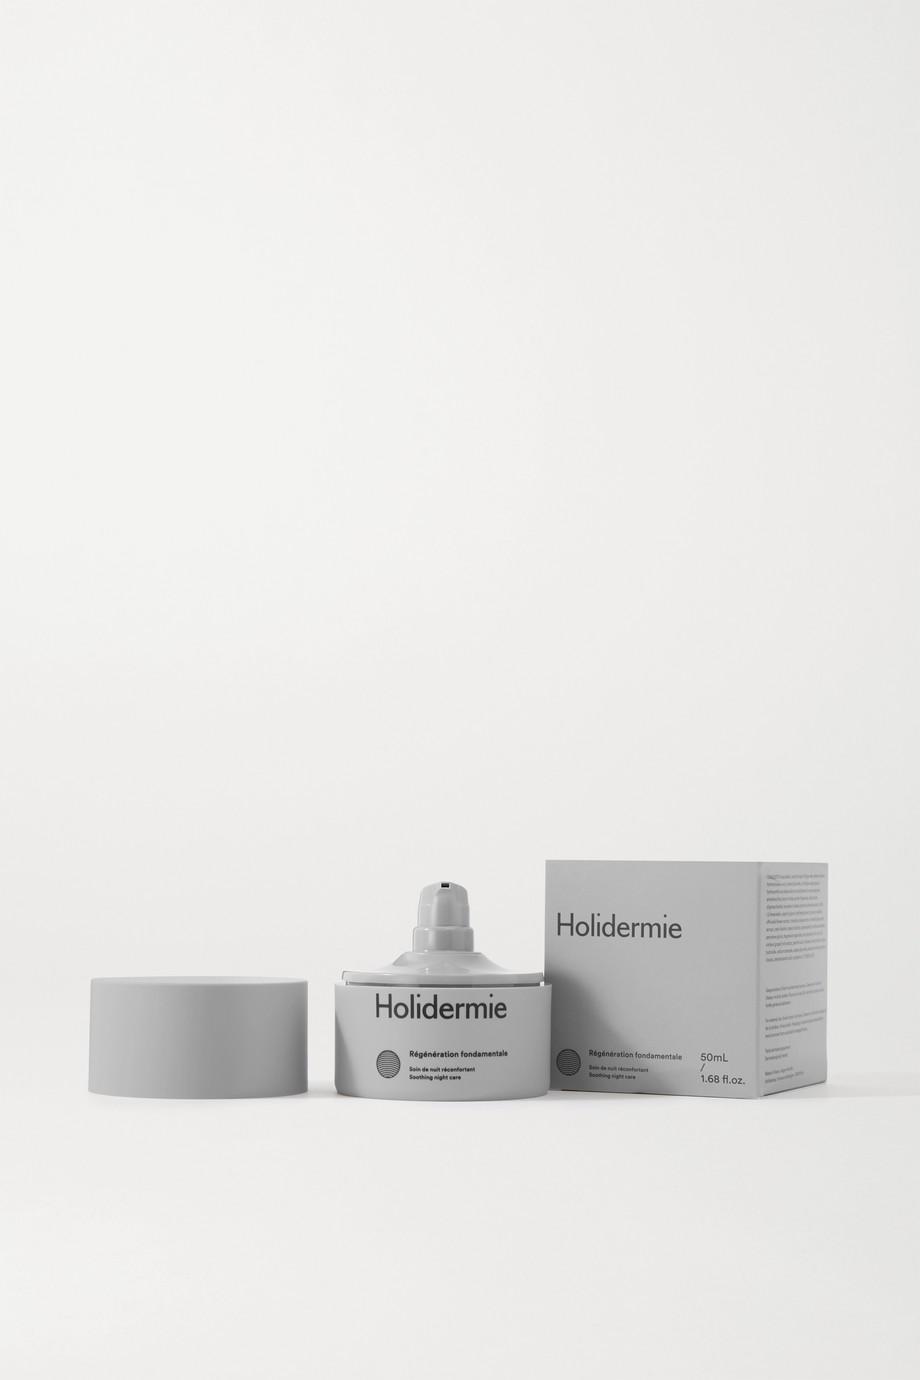 Holidermie Régénération Fondamentale Soothing Night Care, 50 ml – Nachtcreme